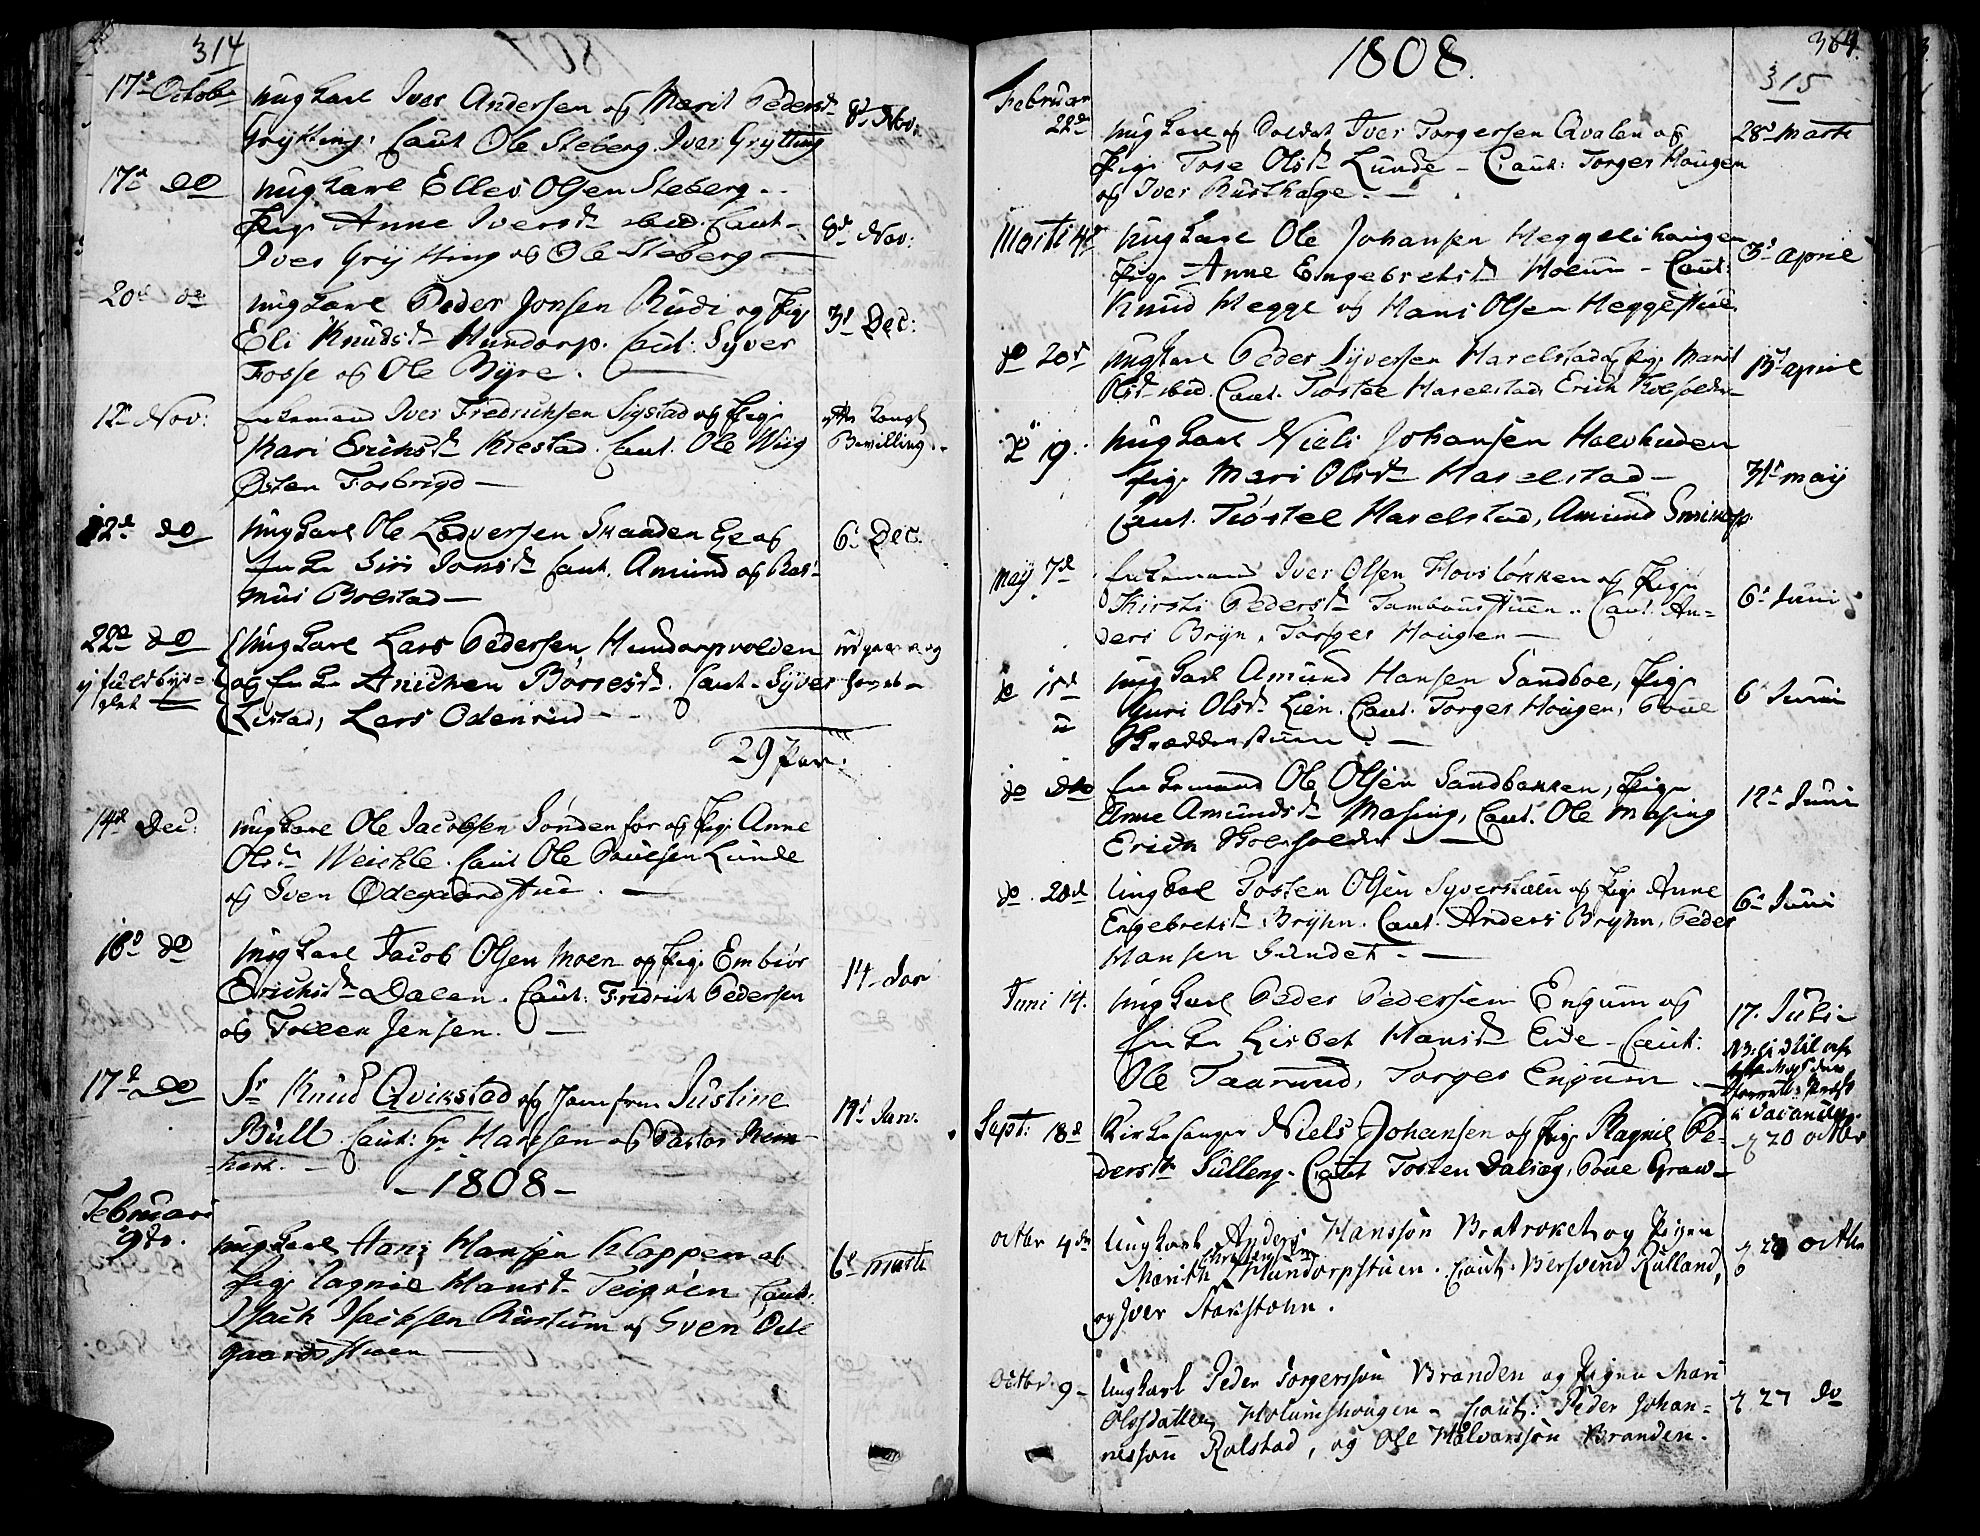 SAH, Fron prestekontor, H/Ha/Haa/L0001: Ministerialbok nr. 1, 1799-1816, s. 314-315